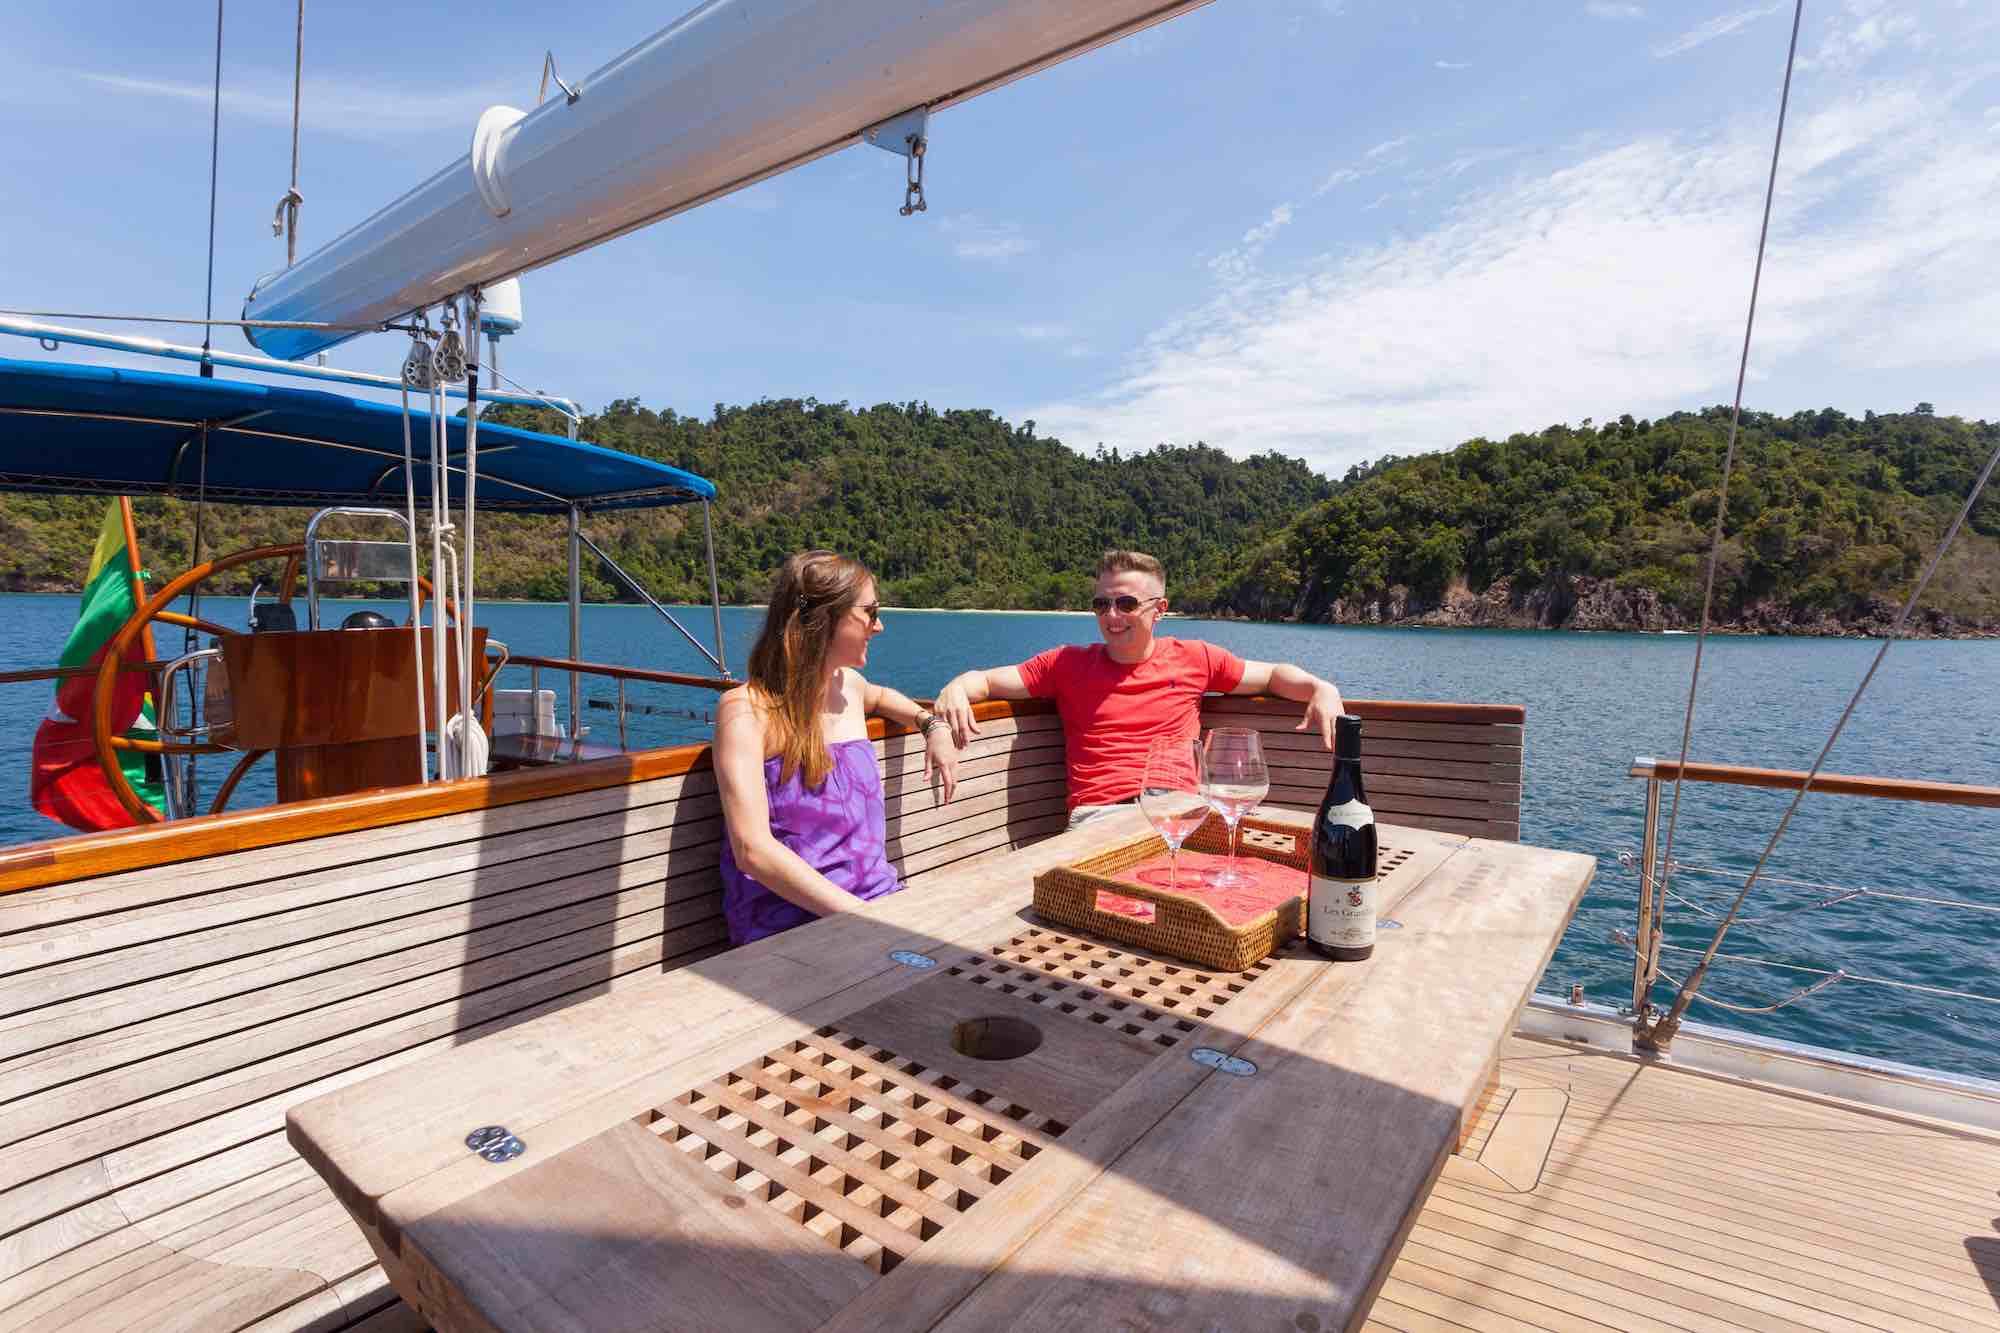 Jubilaeum_guest couple having fun on deck lounge sailing in Mergui_XS.jpeg